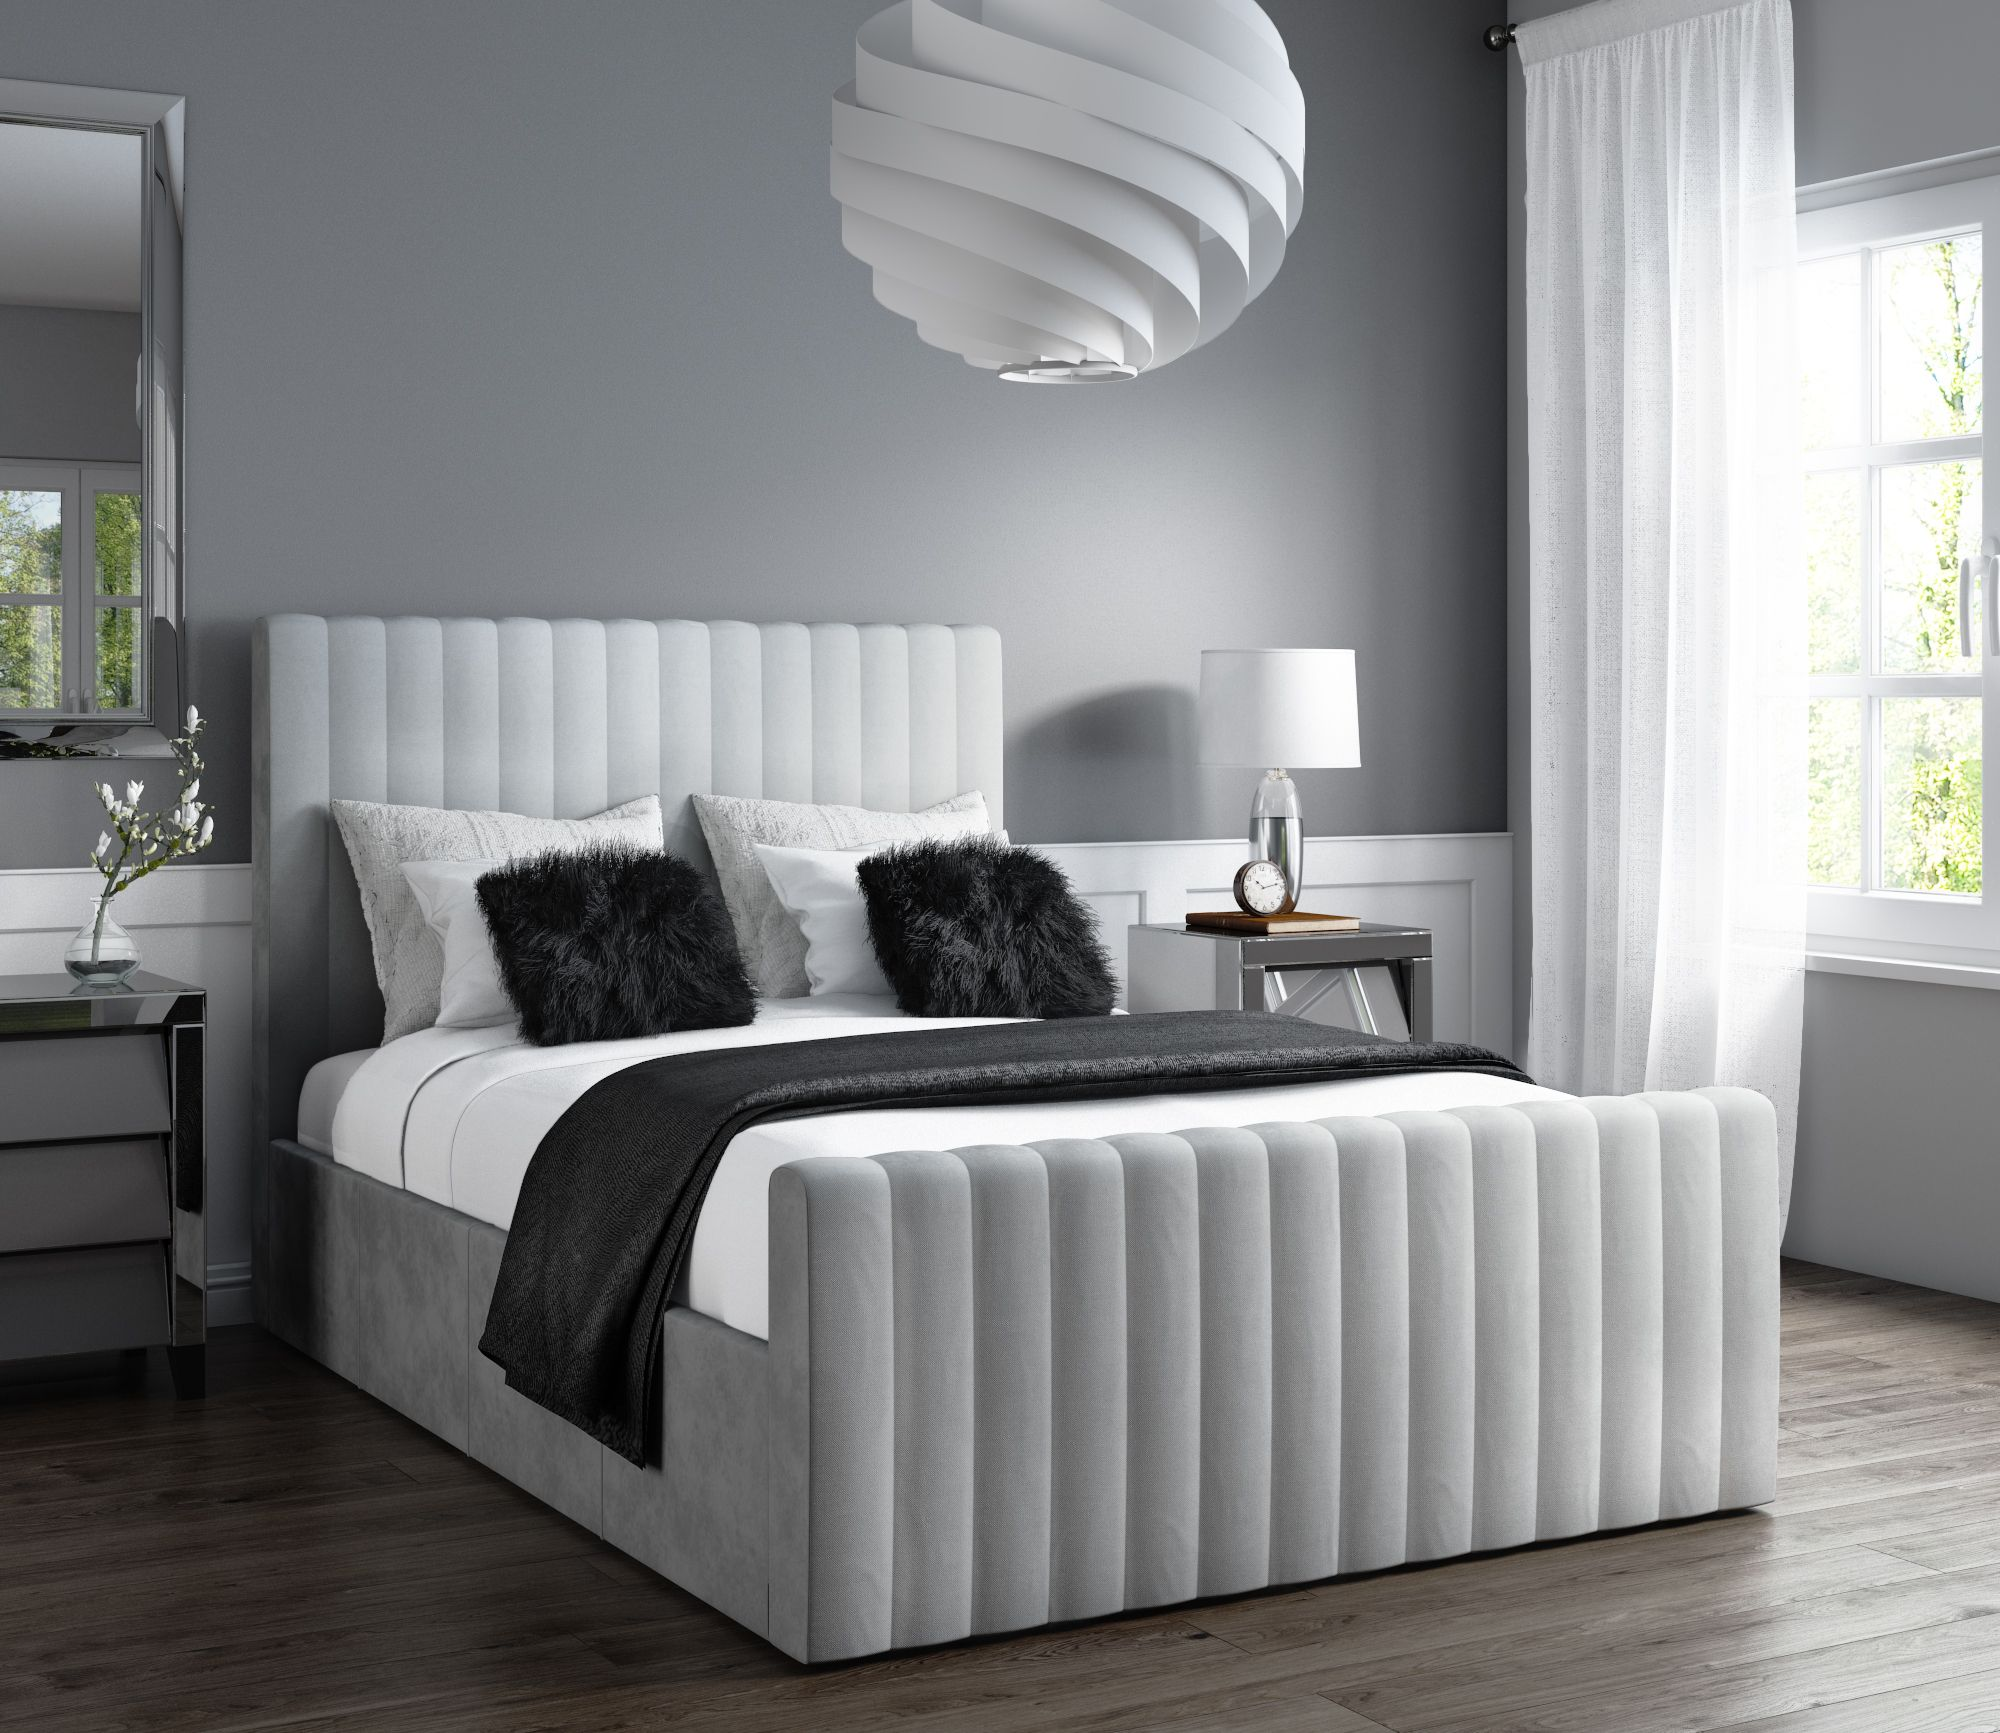 Fabulous Khloe Double Side Ottoman Bed In Silver Grey Velvet Khl002 Creativecarmelina Interior Chair Design Creativecarmelinacom